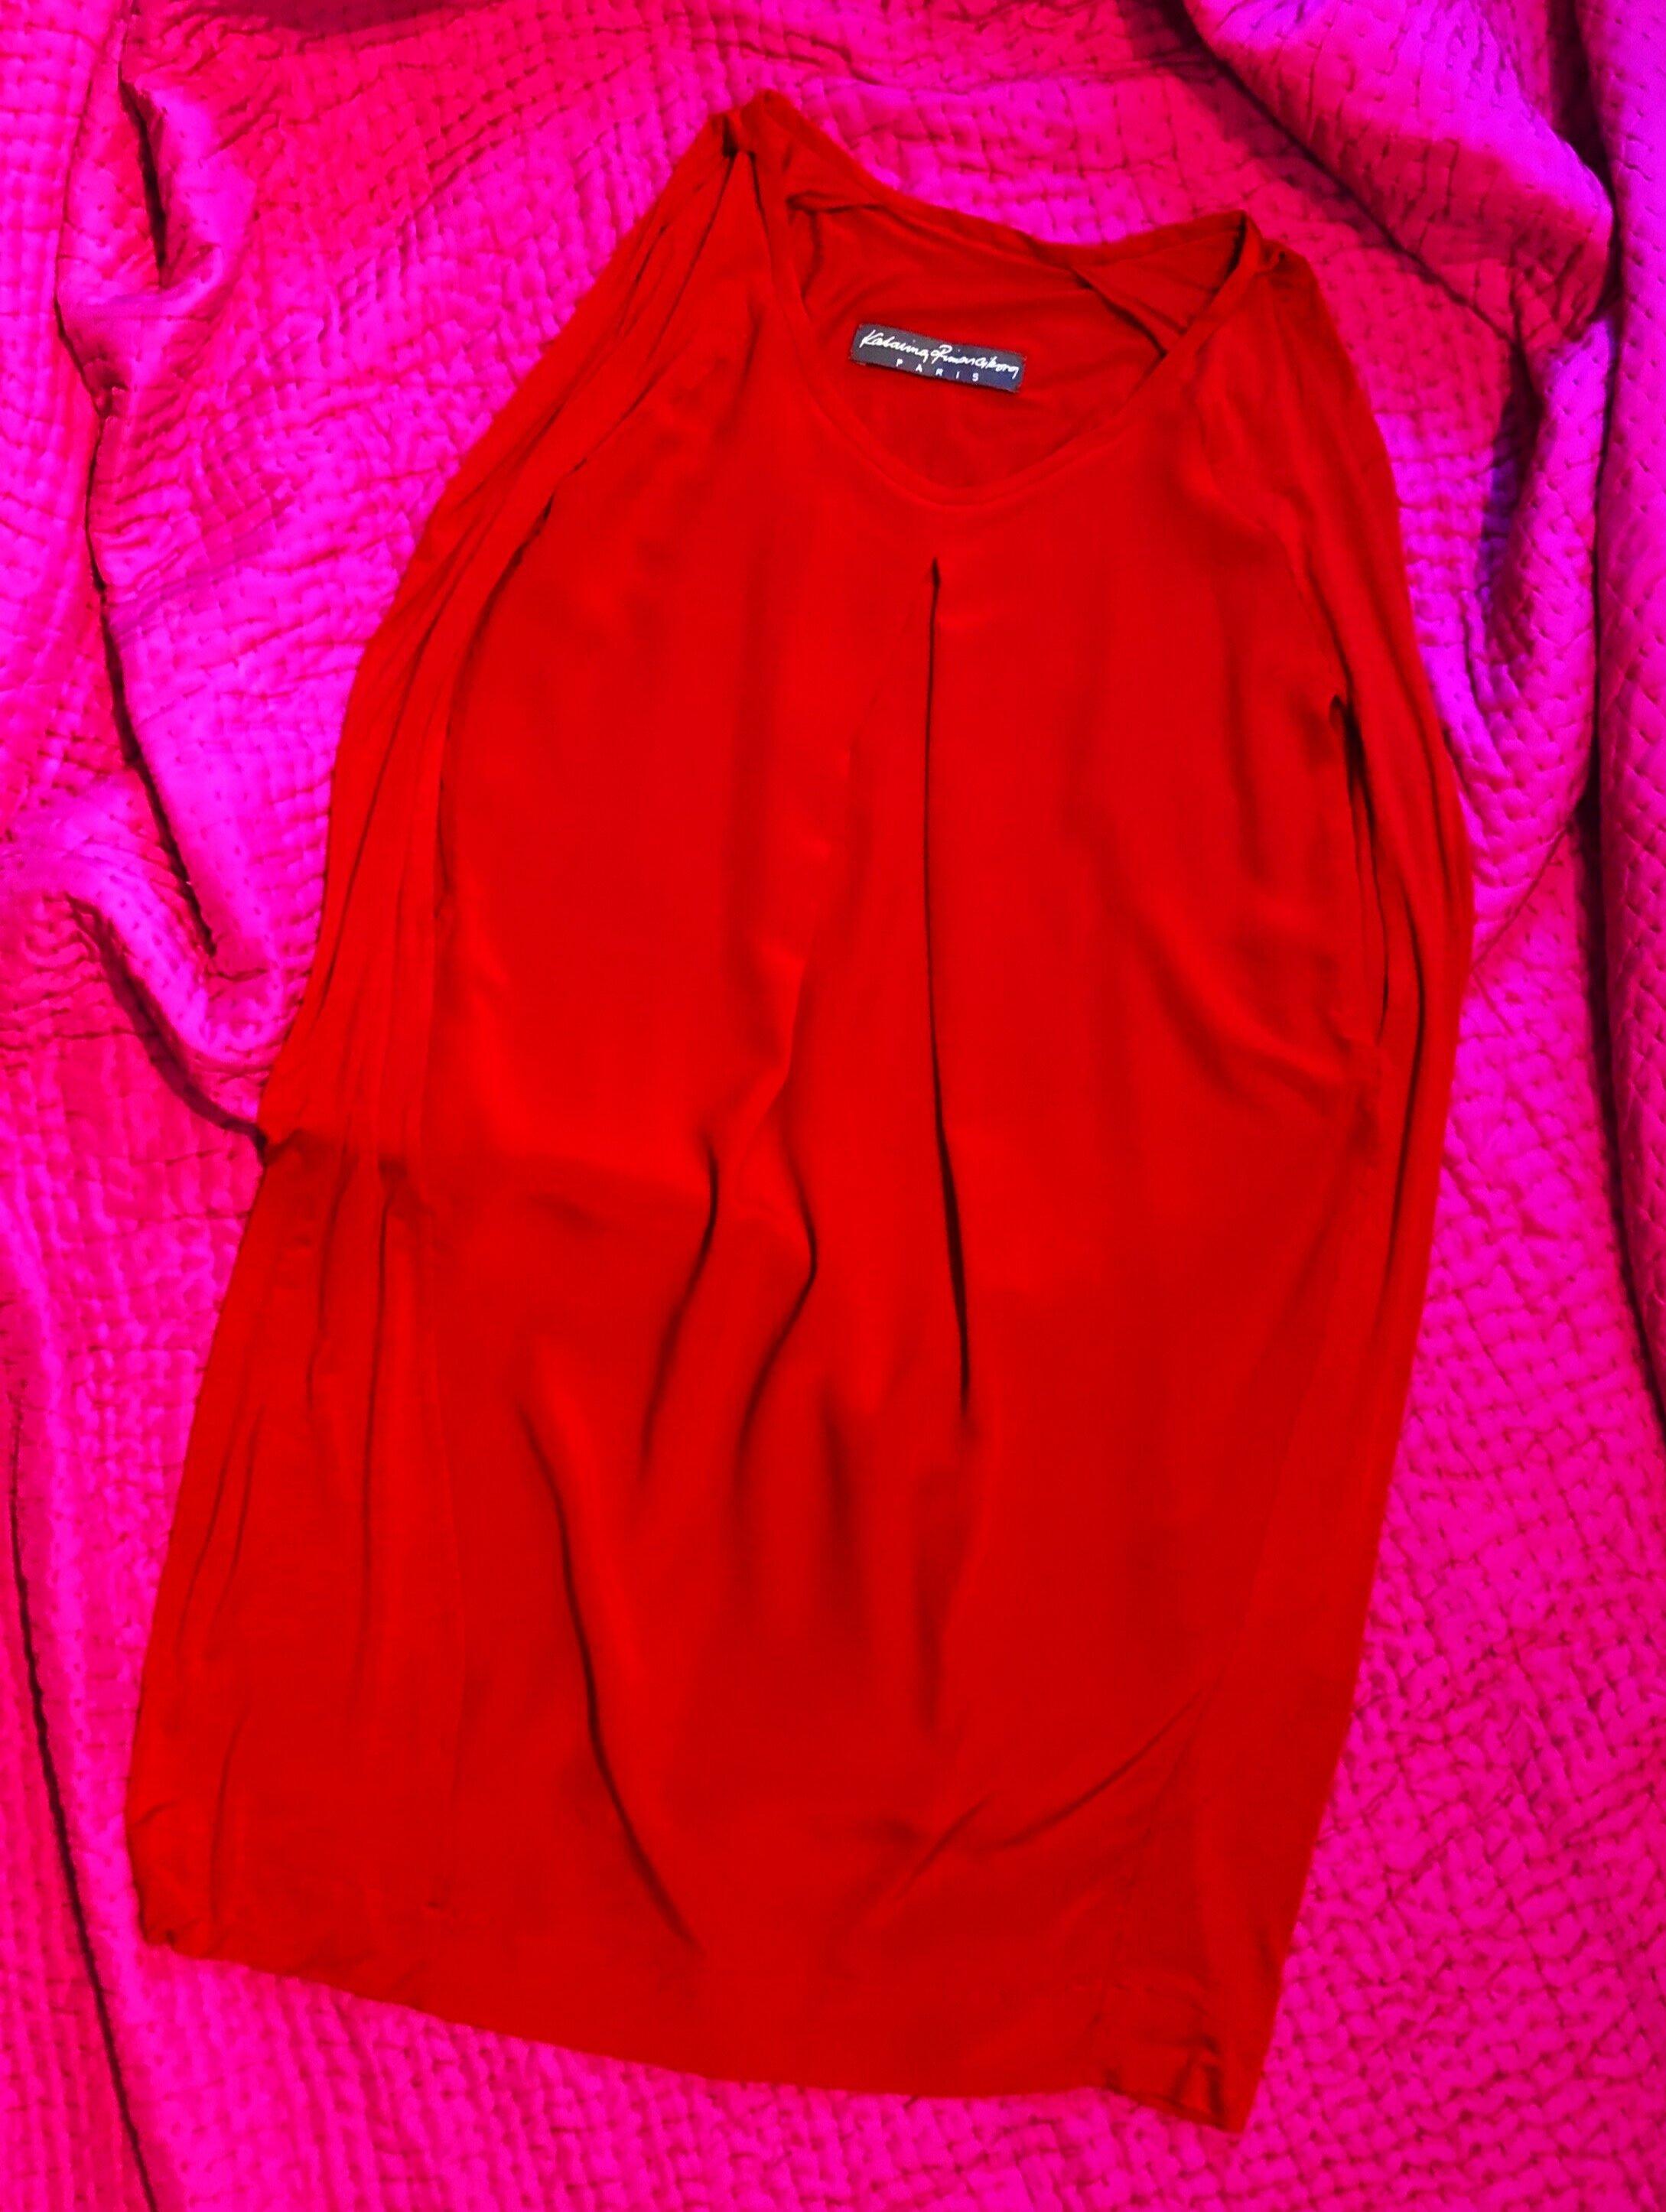 RED 2 SIDE DRESS